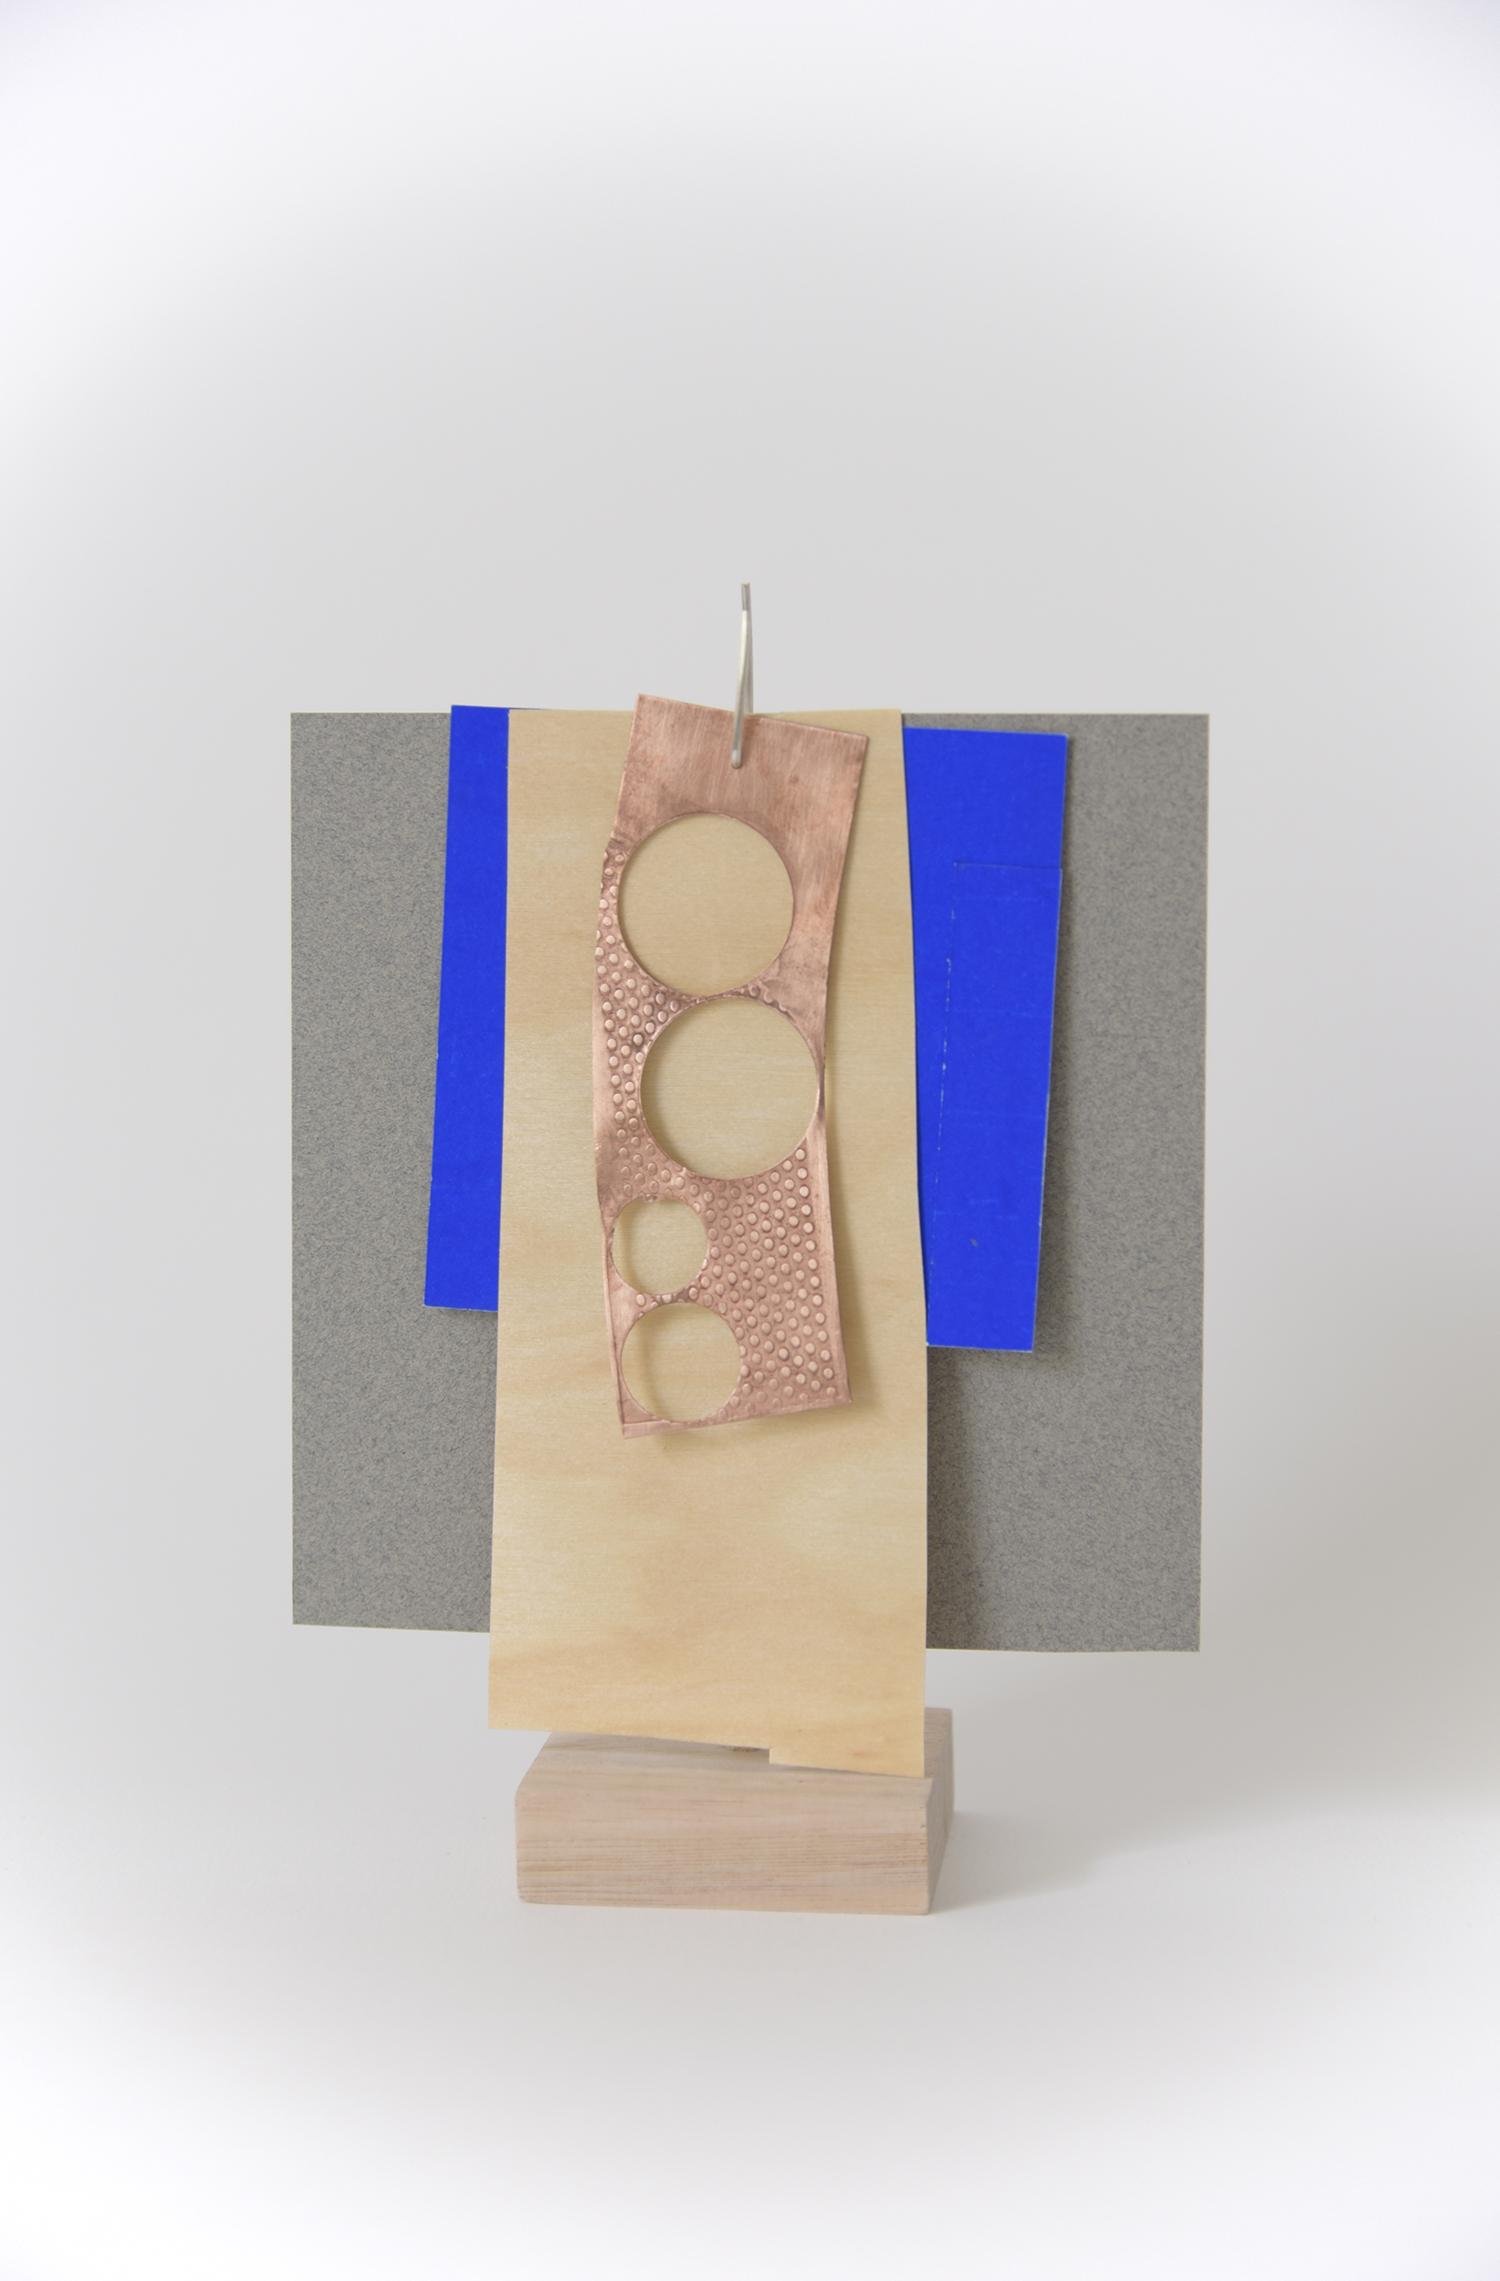 Hardbody Sculpture (Object) I (front)